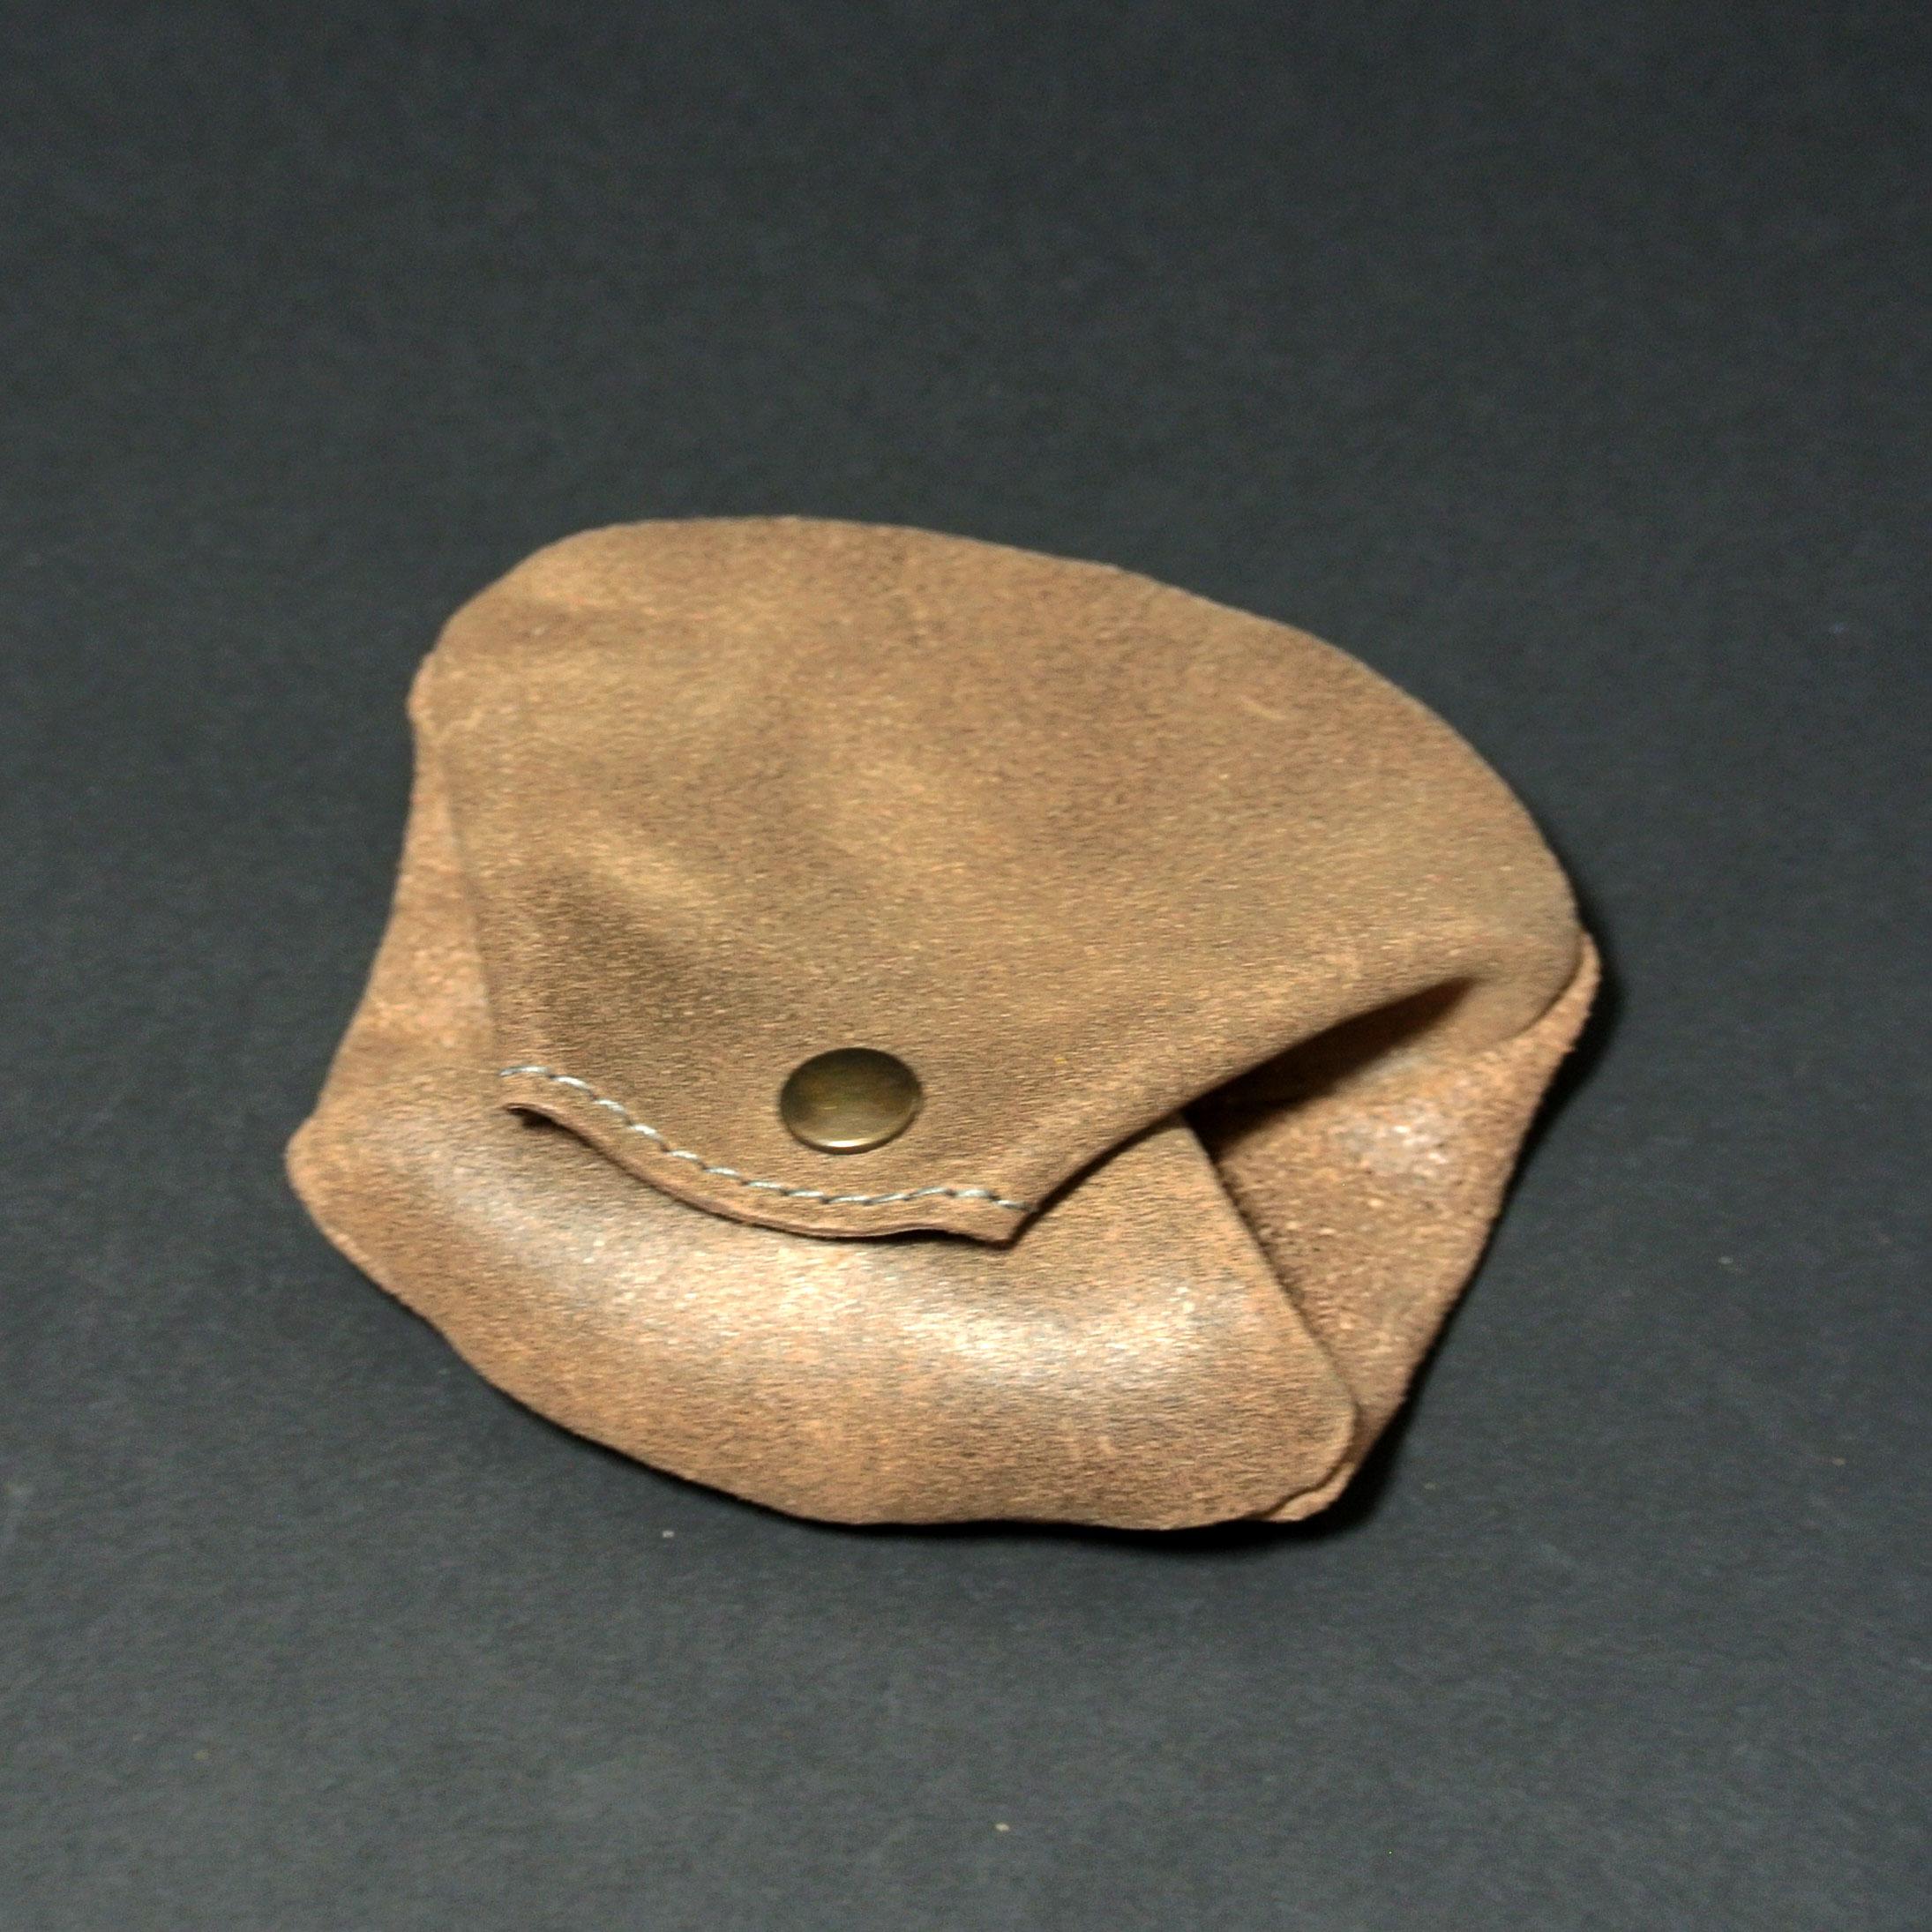 Joli porte monnaie crapaud, pour homme, en cuir rétro, en cuir vintage, made in france, marron chocolat